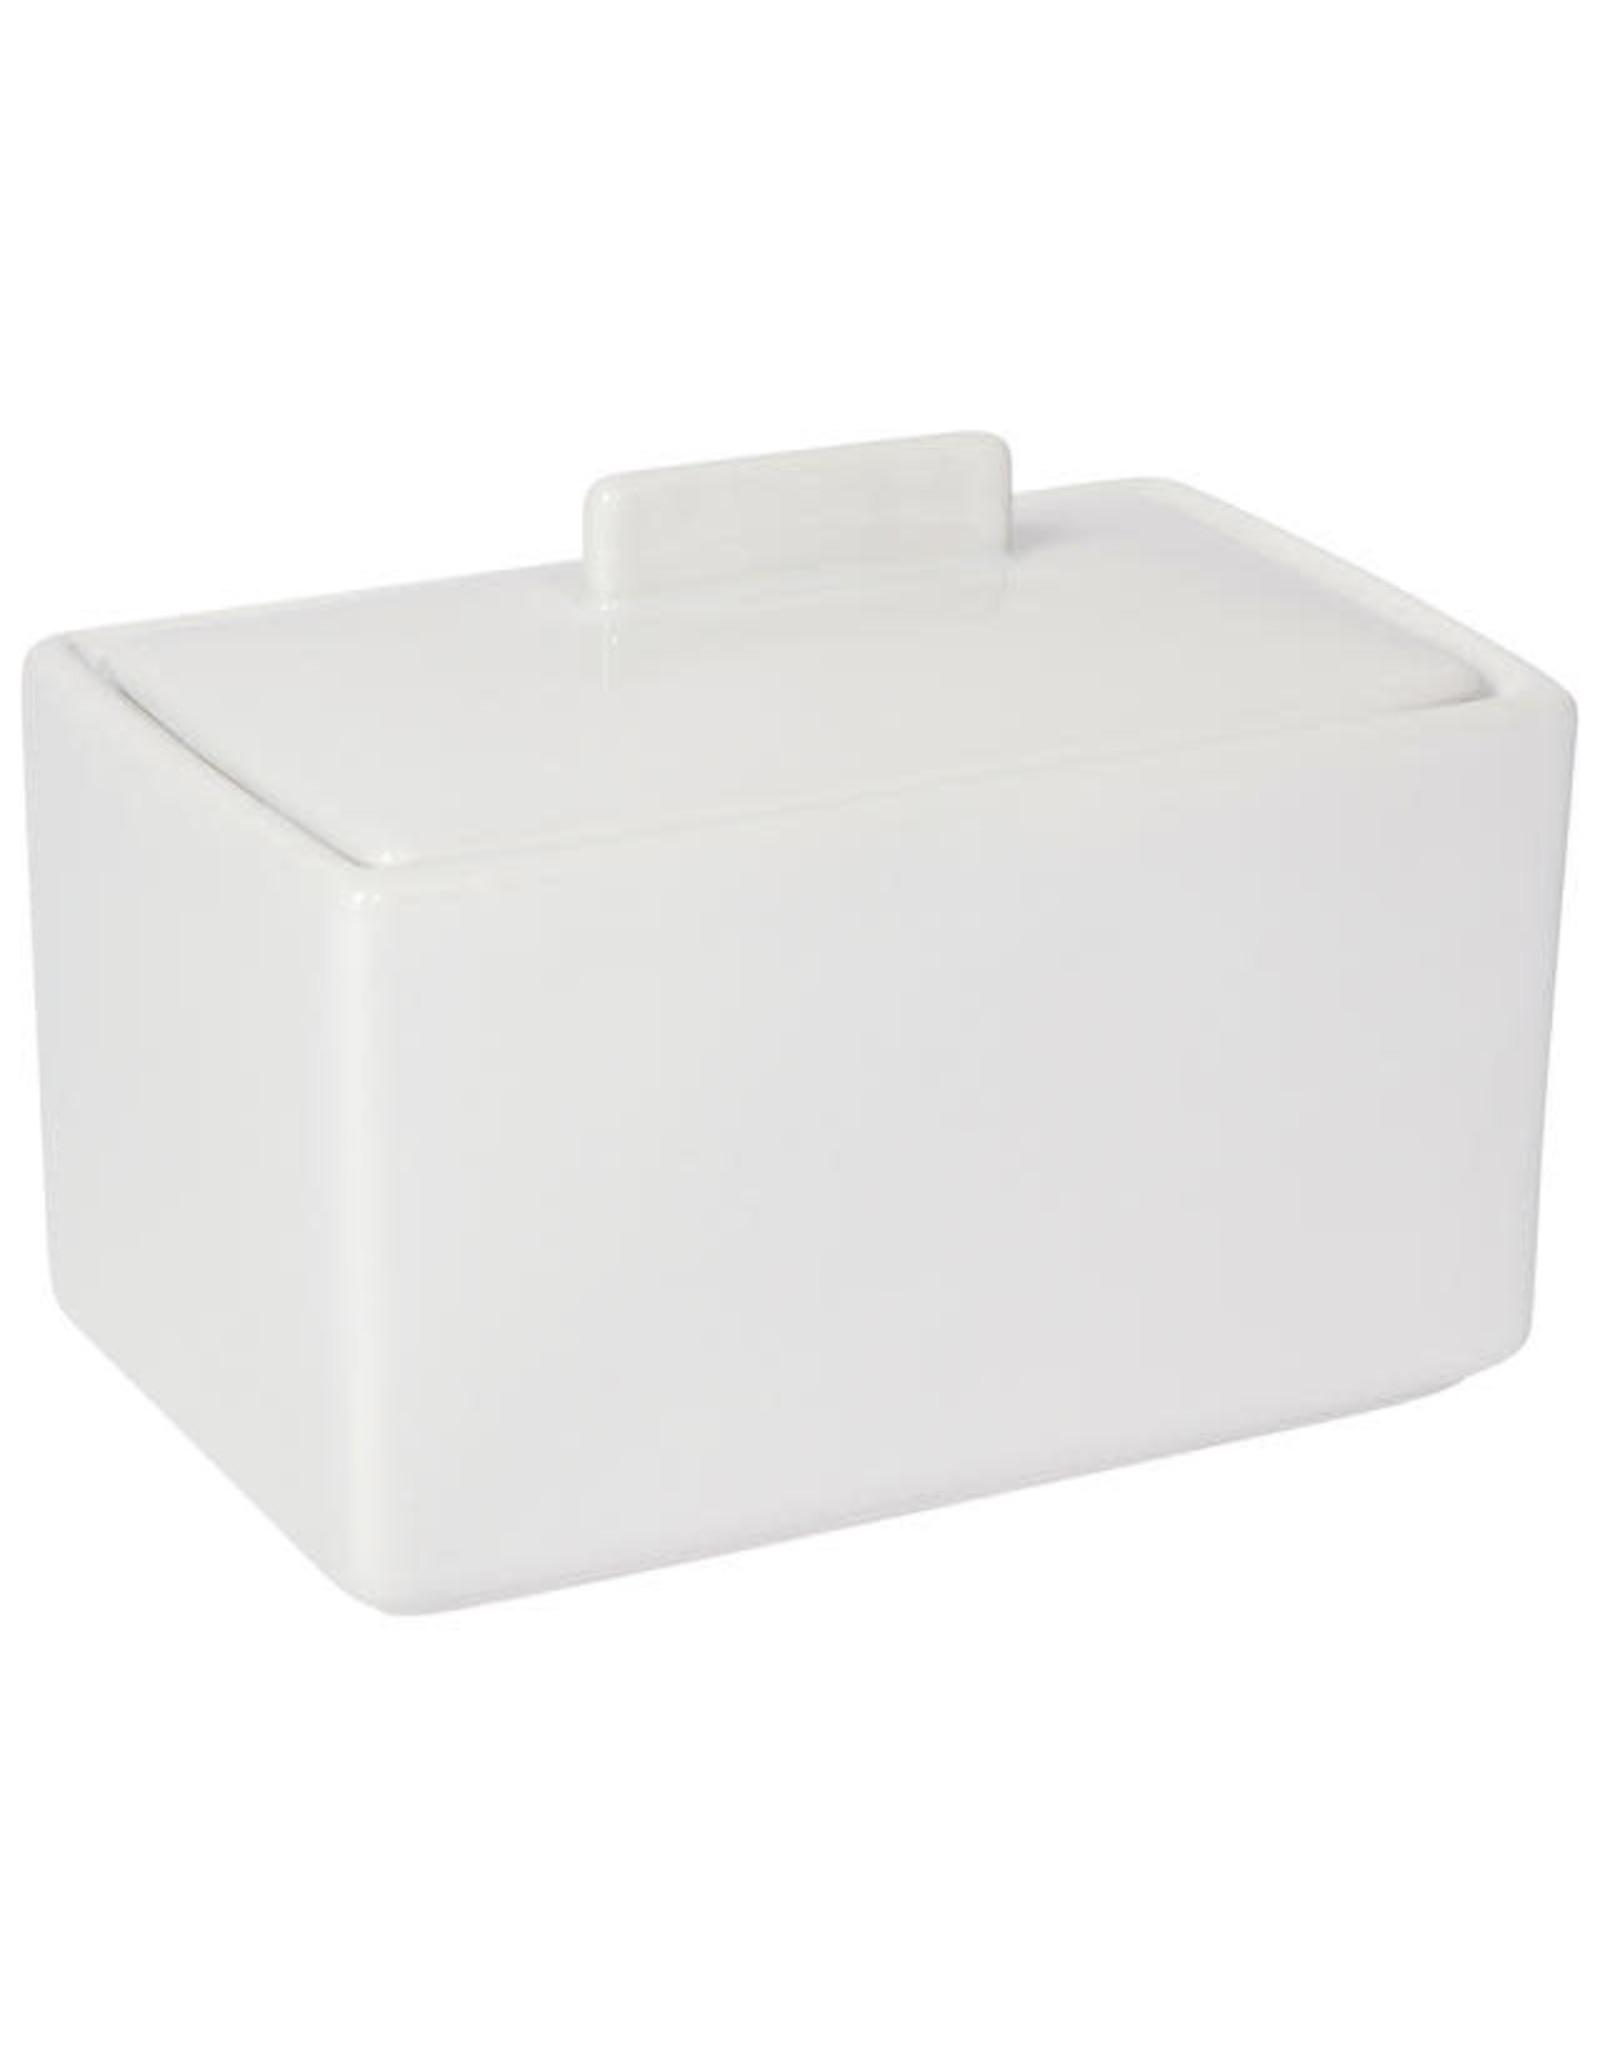 1lb Butter Dish White